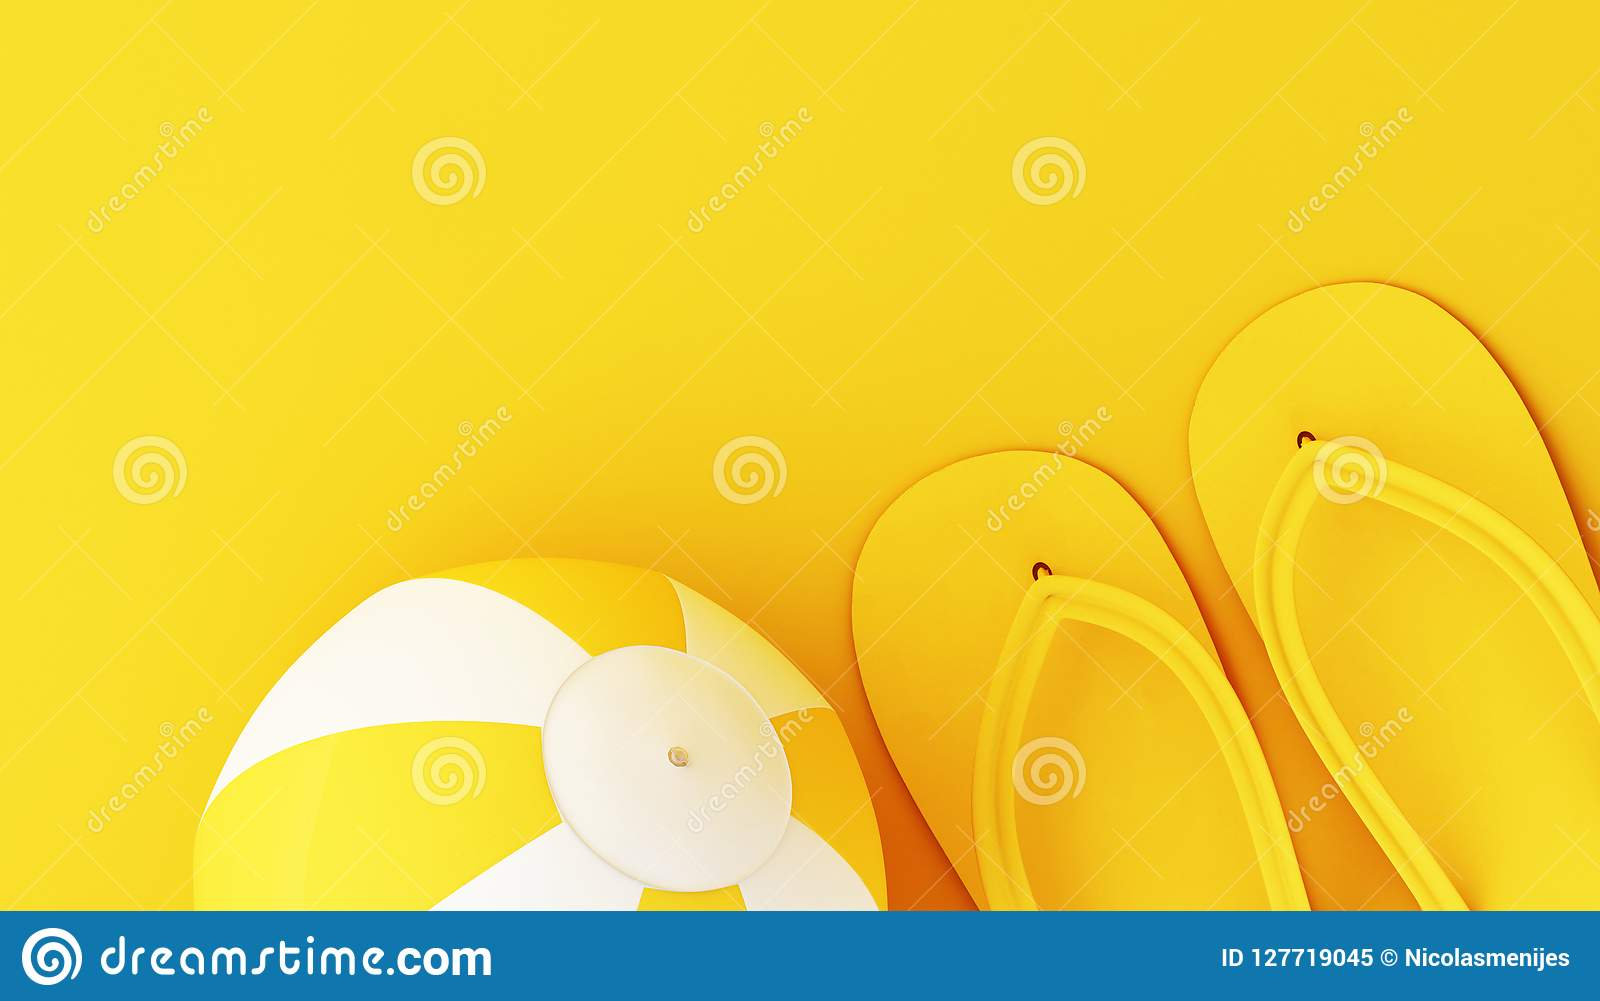 05d8a24d1 Flip flops and beach ball on yellow background. Minimal summer concept.